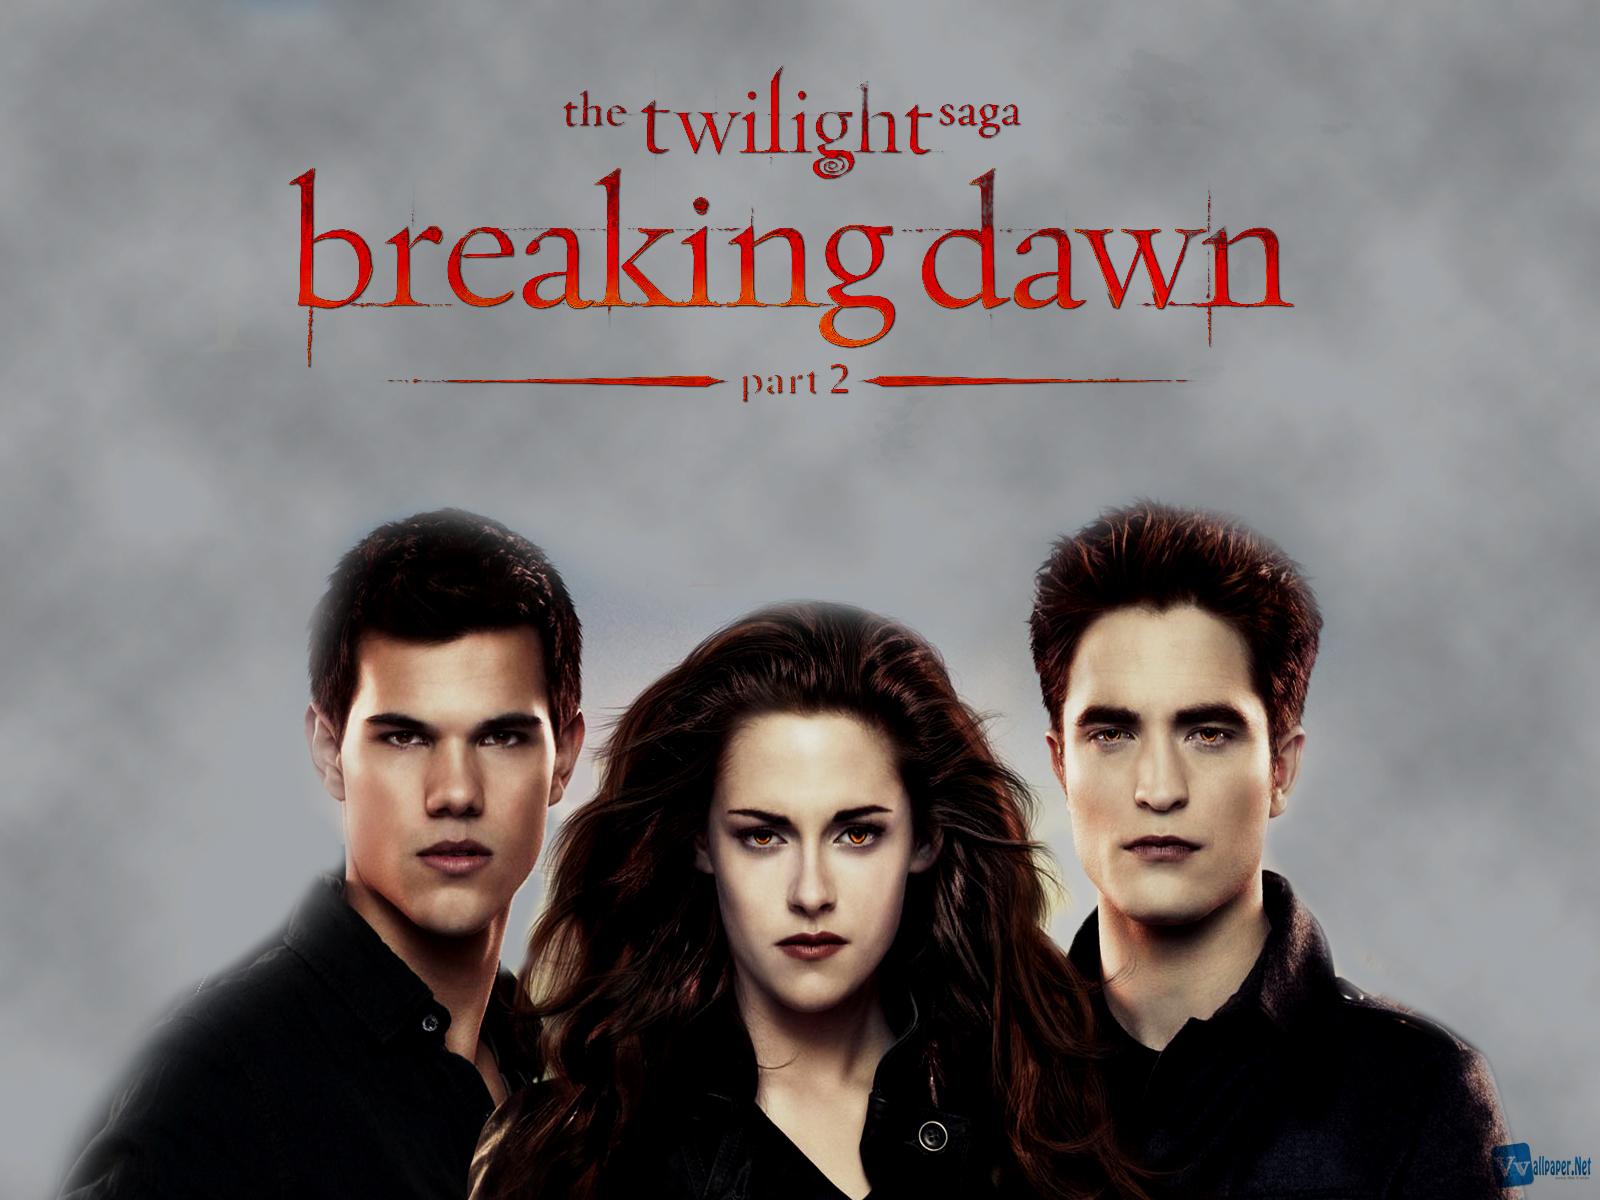 The Twilight Saga Breaking Dawn Part 2 Main Characters HD Wallpaper By VvallpaperNet